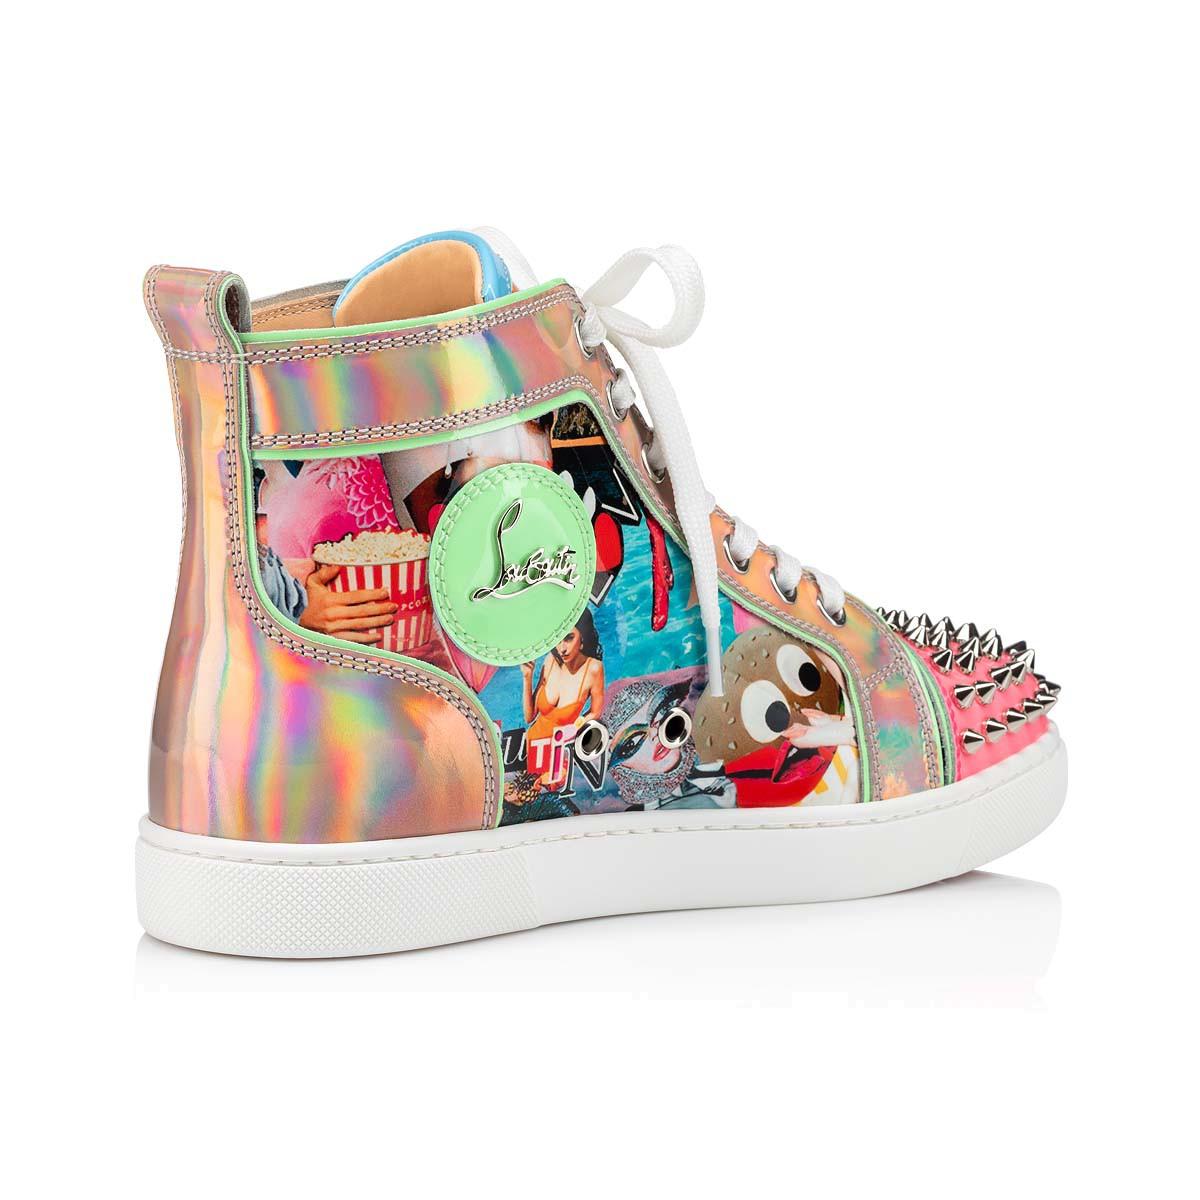 Shoes - Lou Spikes Woman Flat - Christian Louboutin